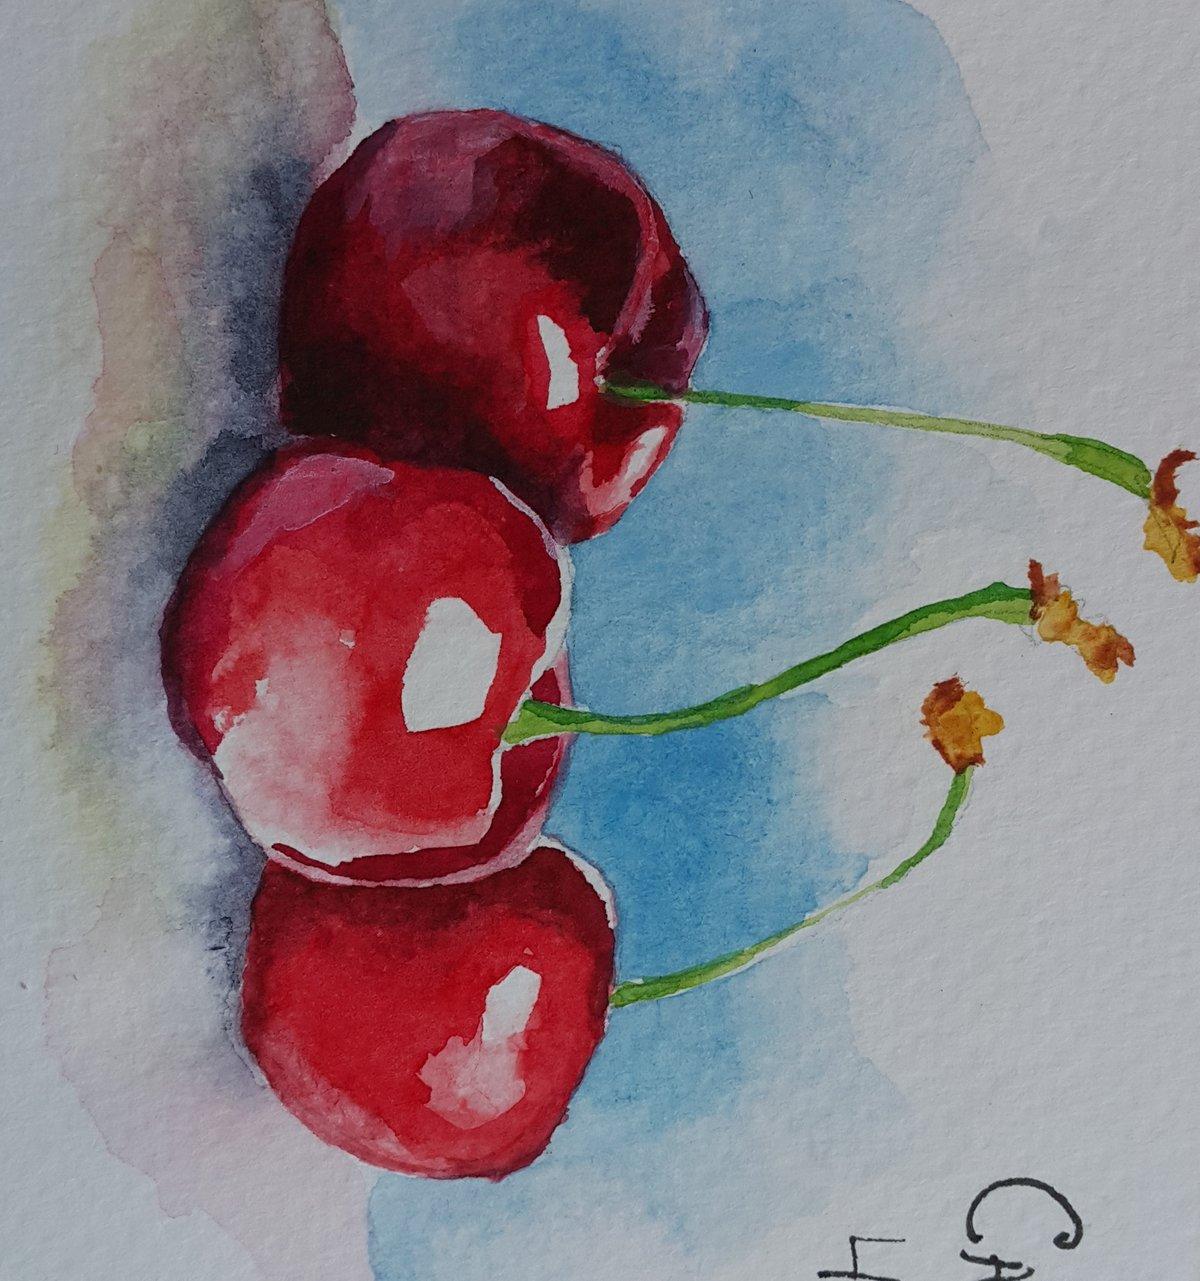 Картинки можно нарисовать красками